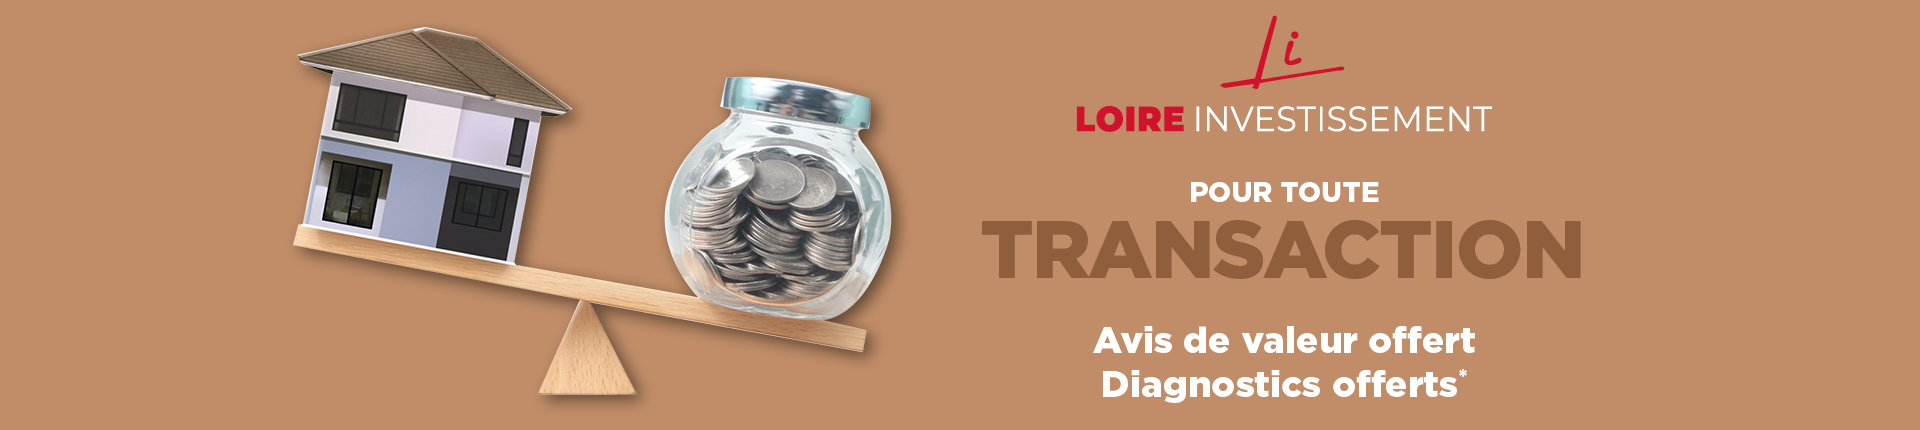 Transactions Immobilières, gestion locative, syndic, courtage bancaire, immobilier st etienne